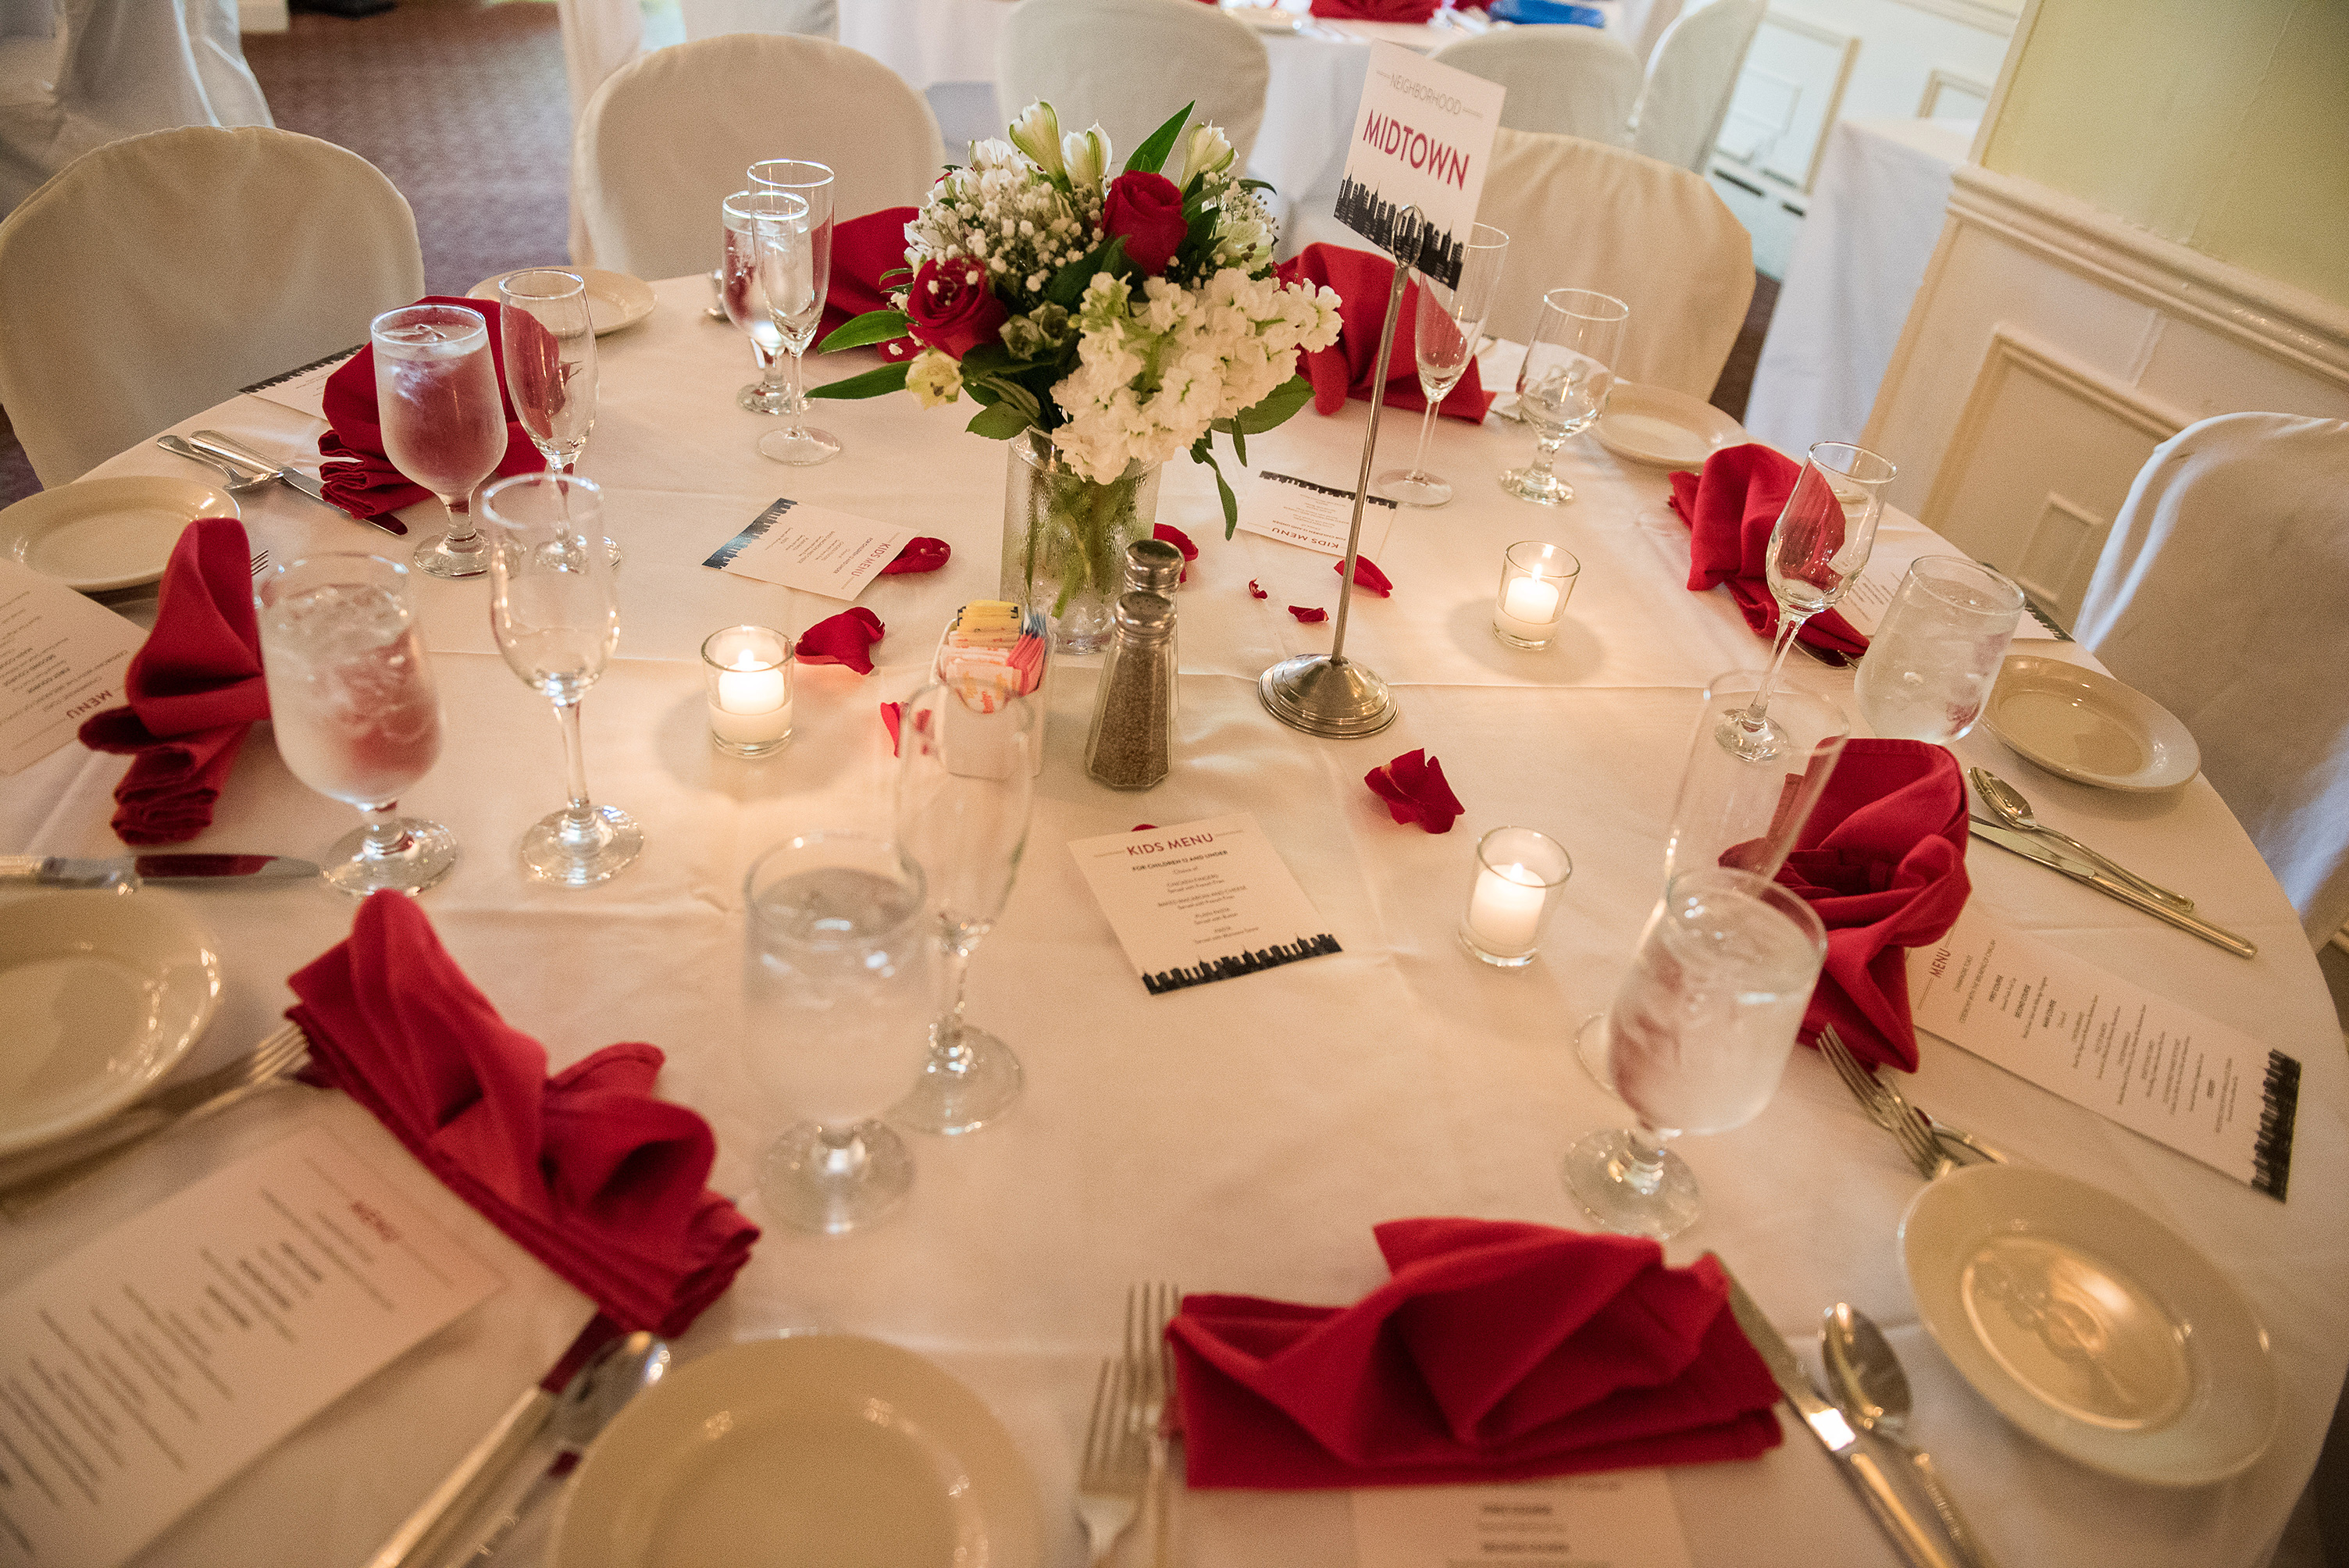 eventdesign_wedding_image23